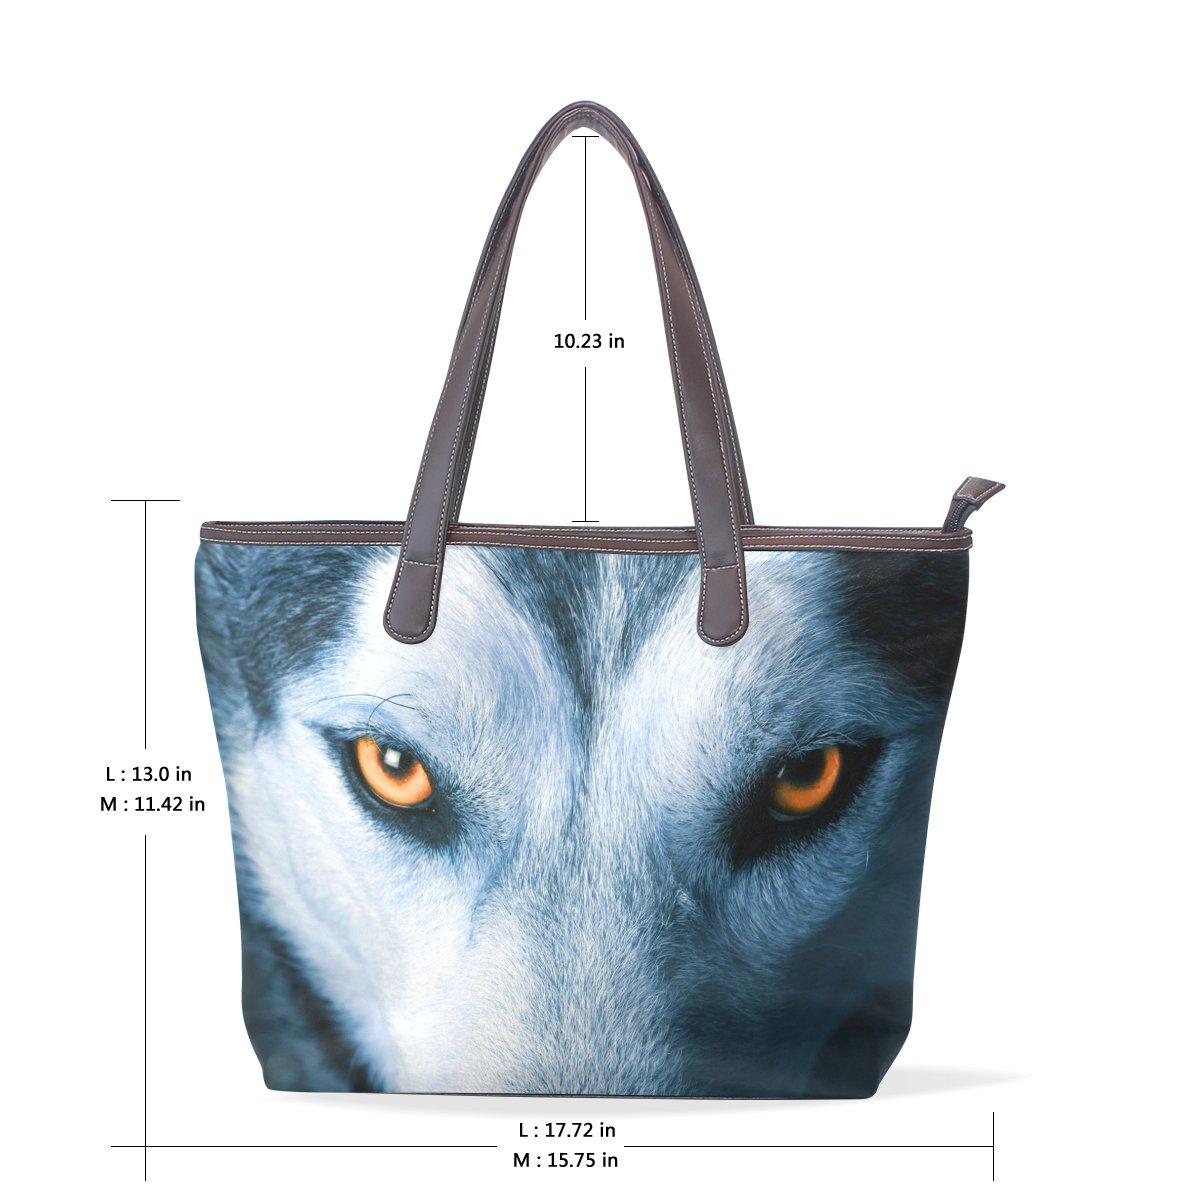 ed846036db28 Amazon.com: LORVIES Eyes Of Wolf Large Tote PU Leather Handle ...